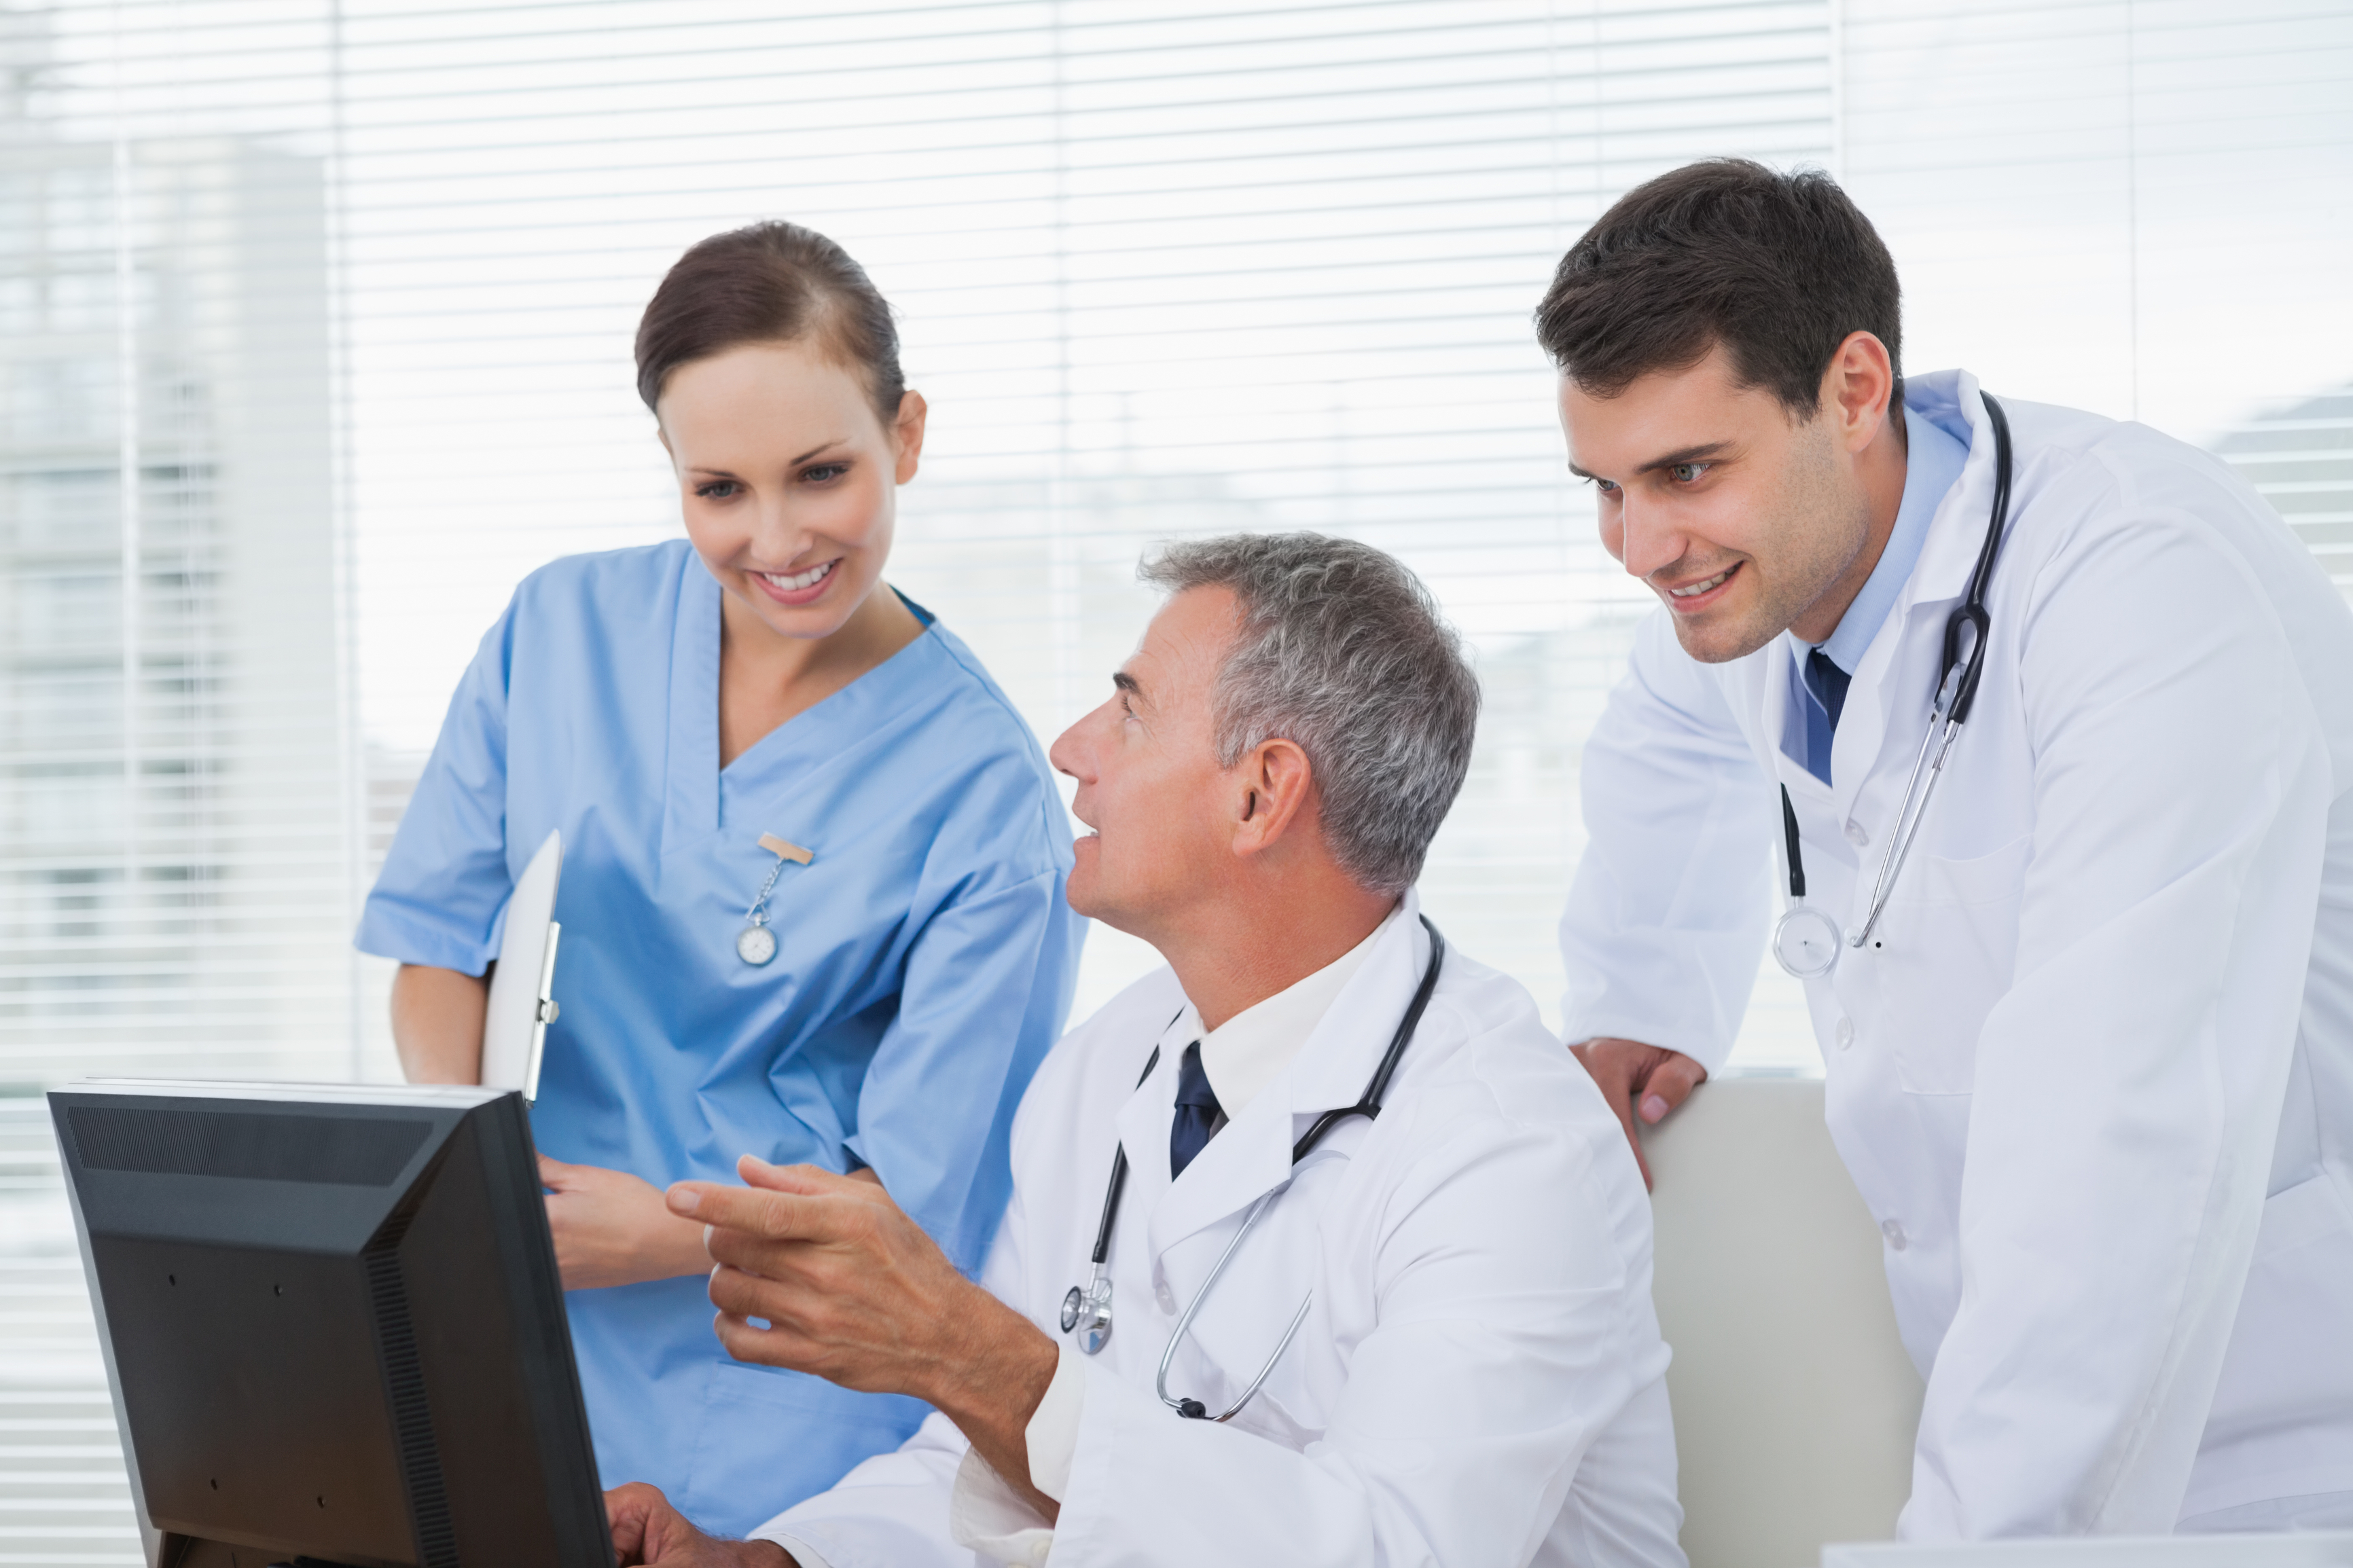 key-patient-info-emr-software-1